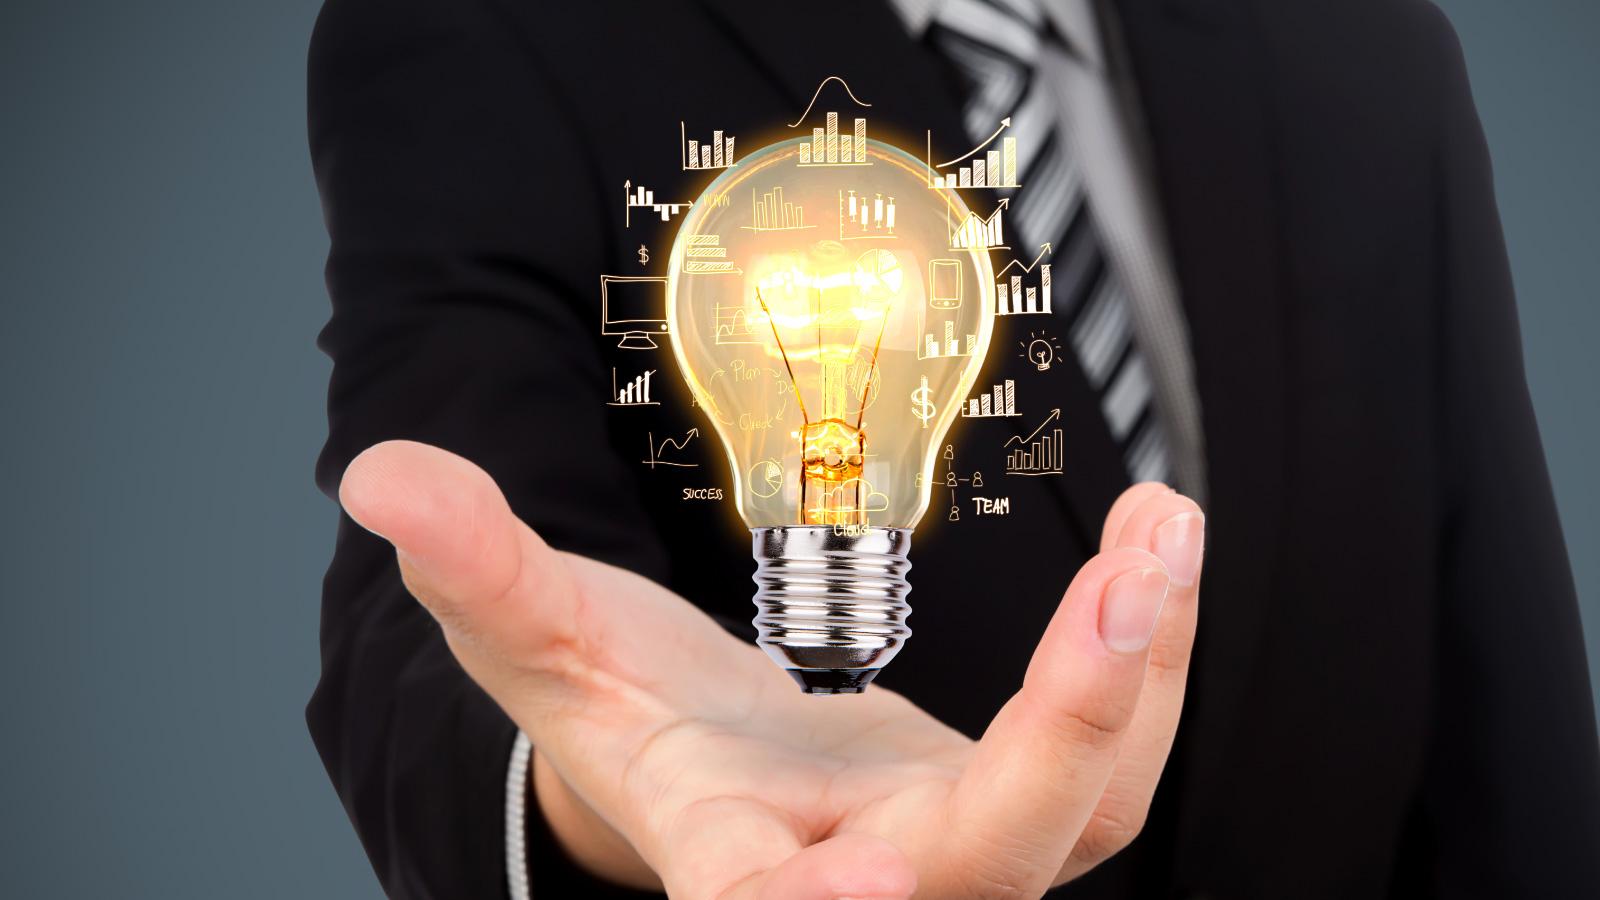 Apa itu Business Intelligence? Definisi & Contoh